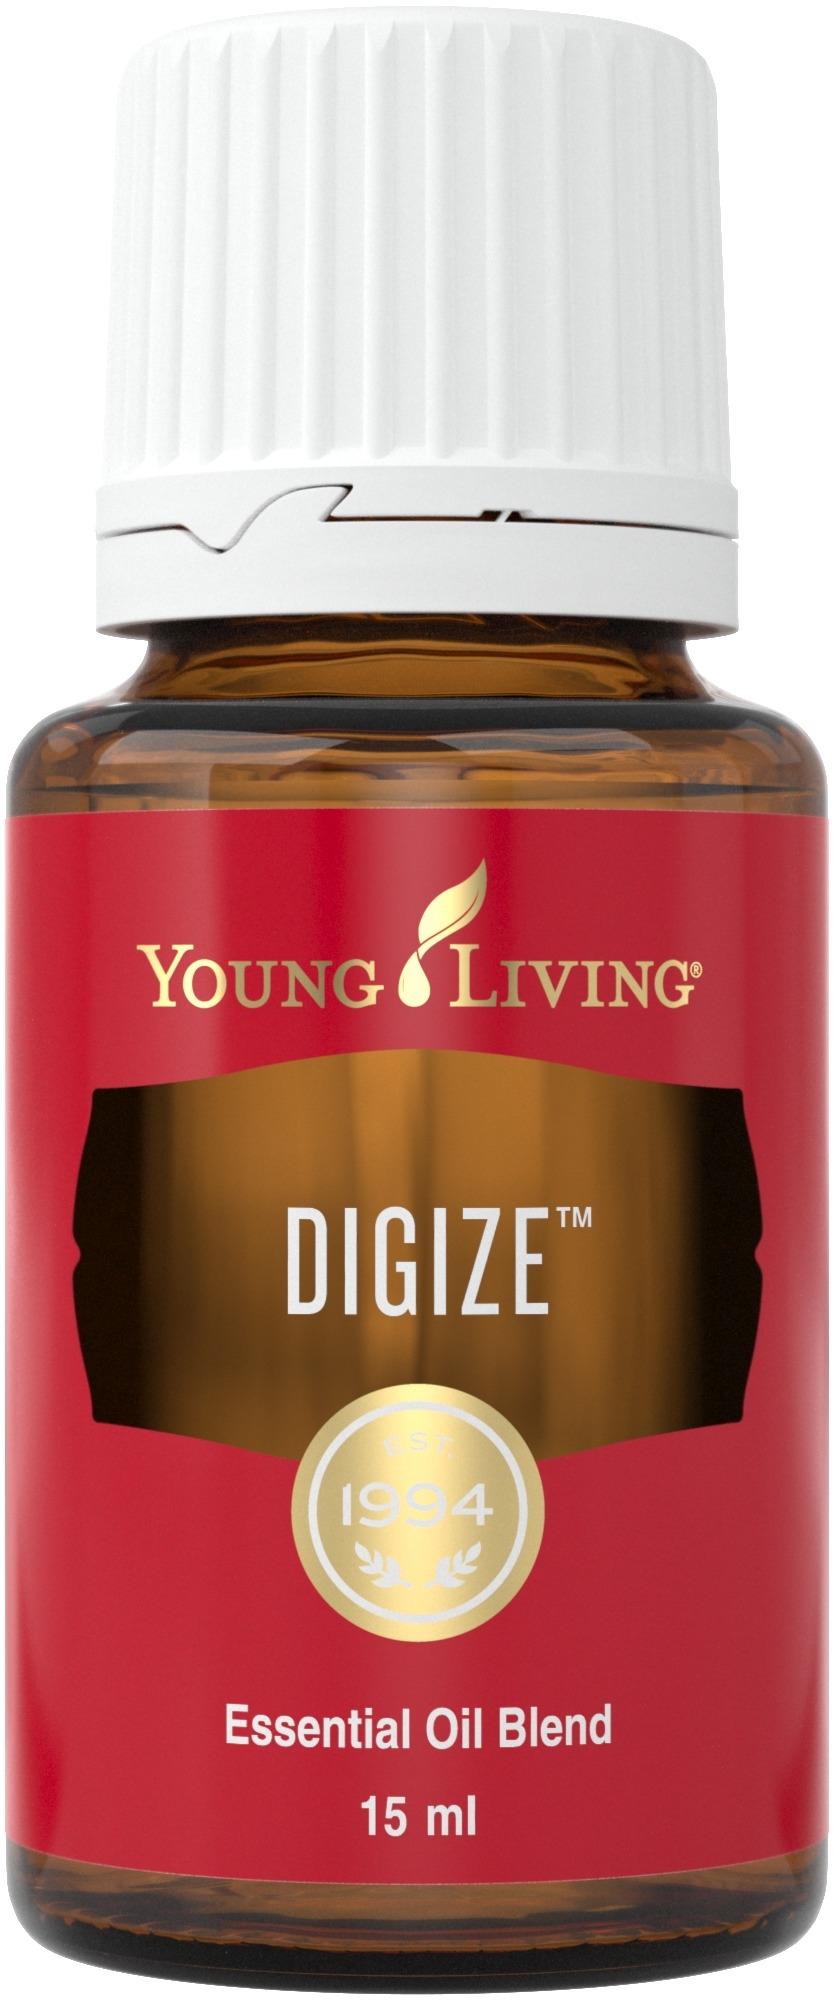 Campuran minyak esensial DiGize